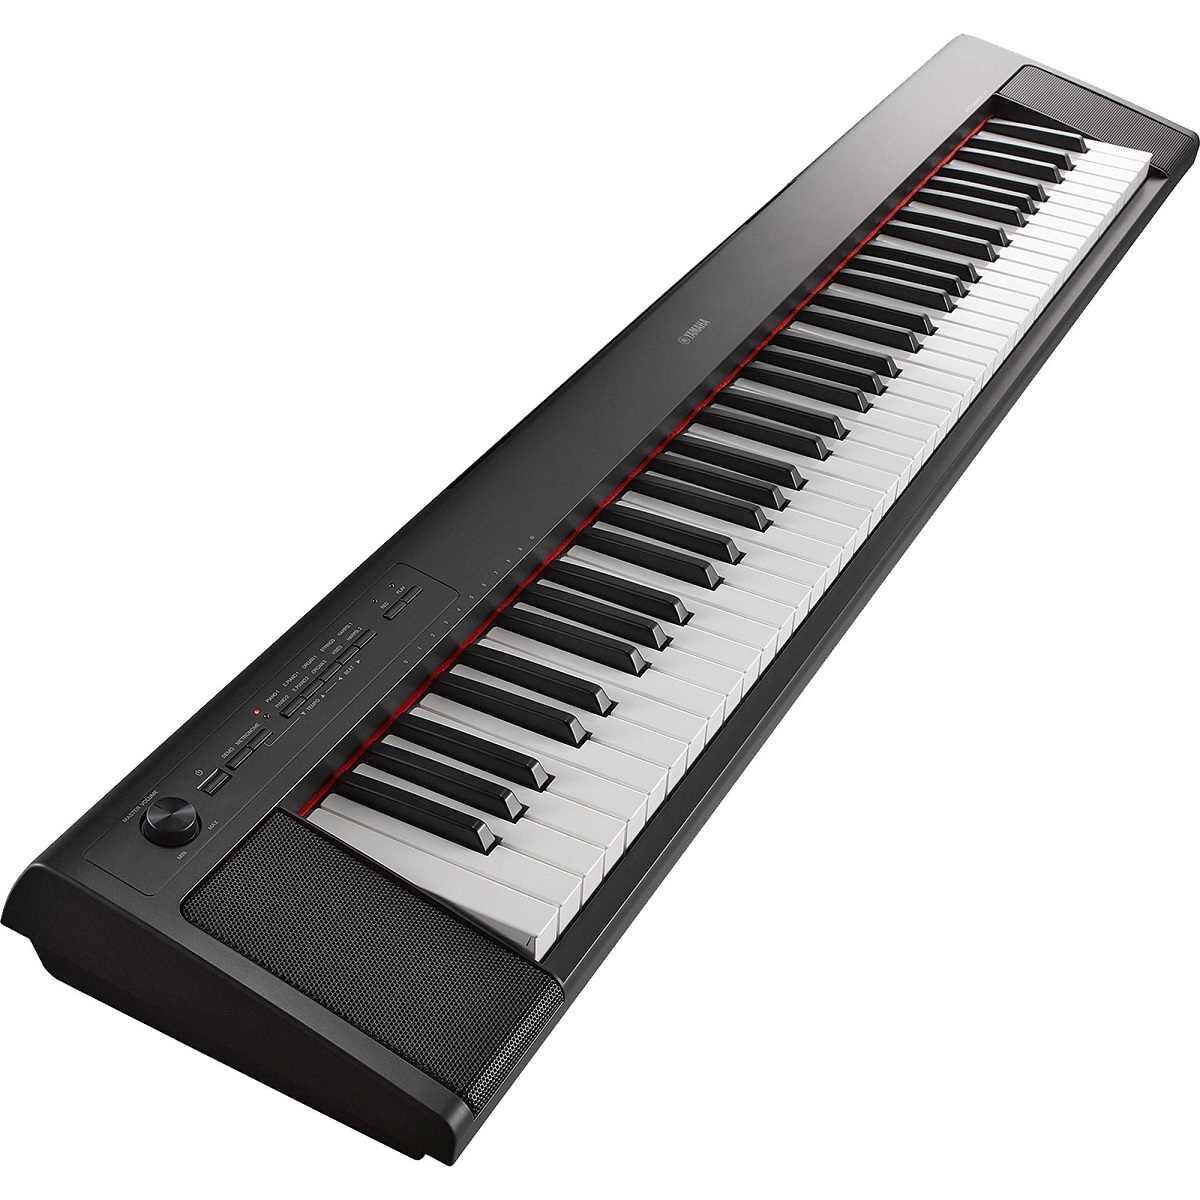 Teclado Piaggero NP-32B Preto Yamaha Com Fonte Bivolt